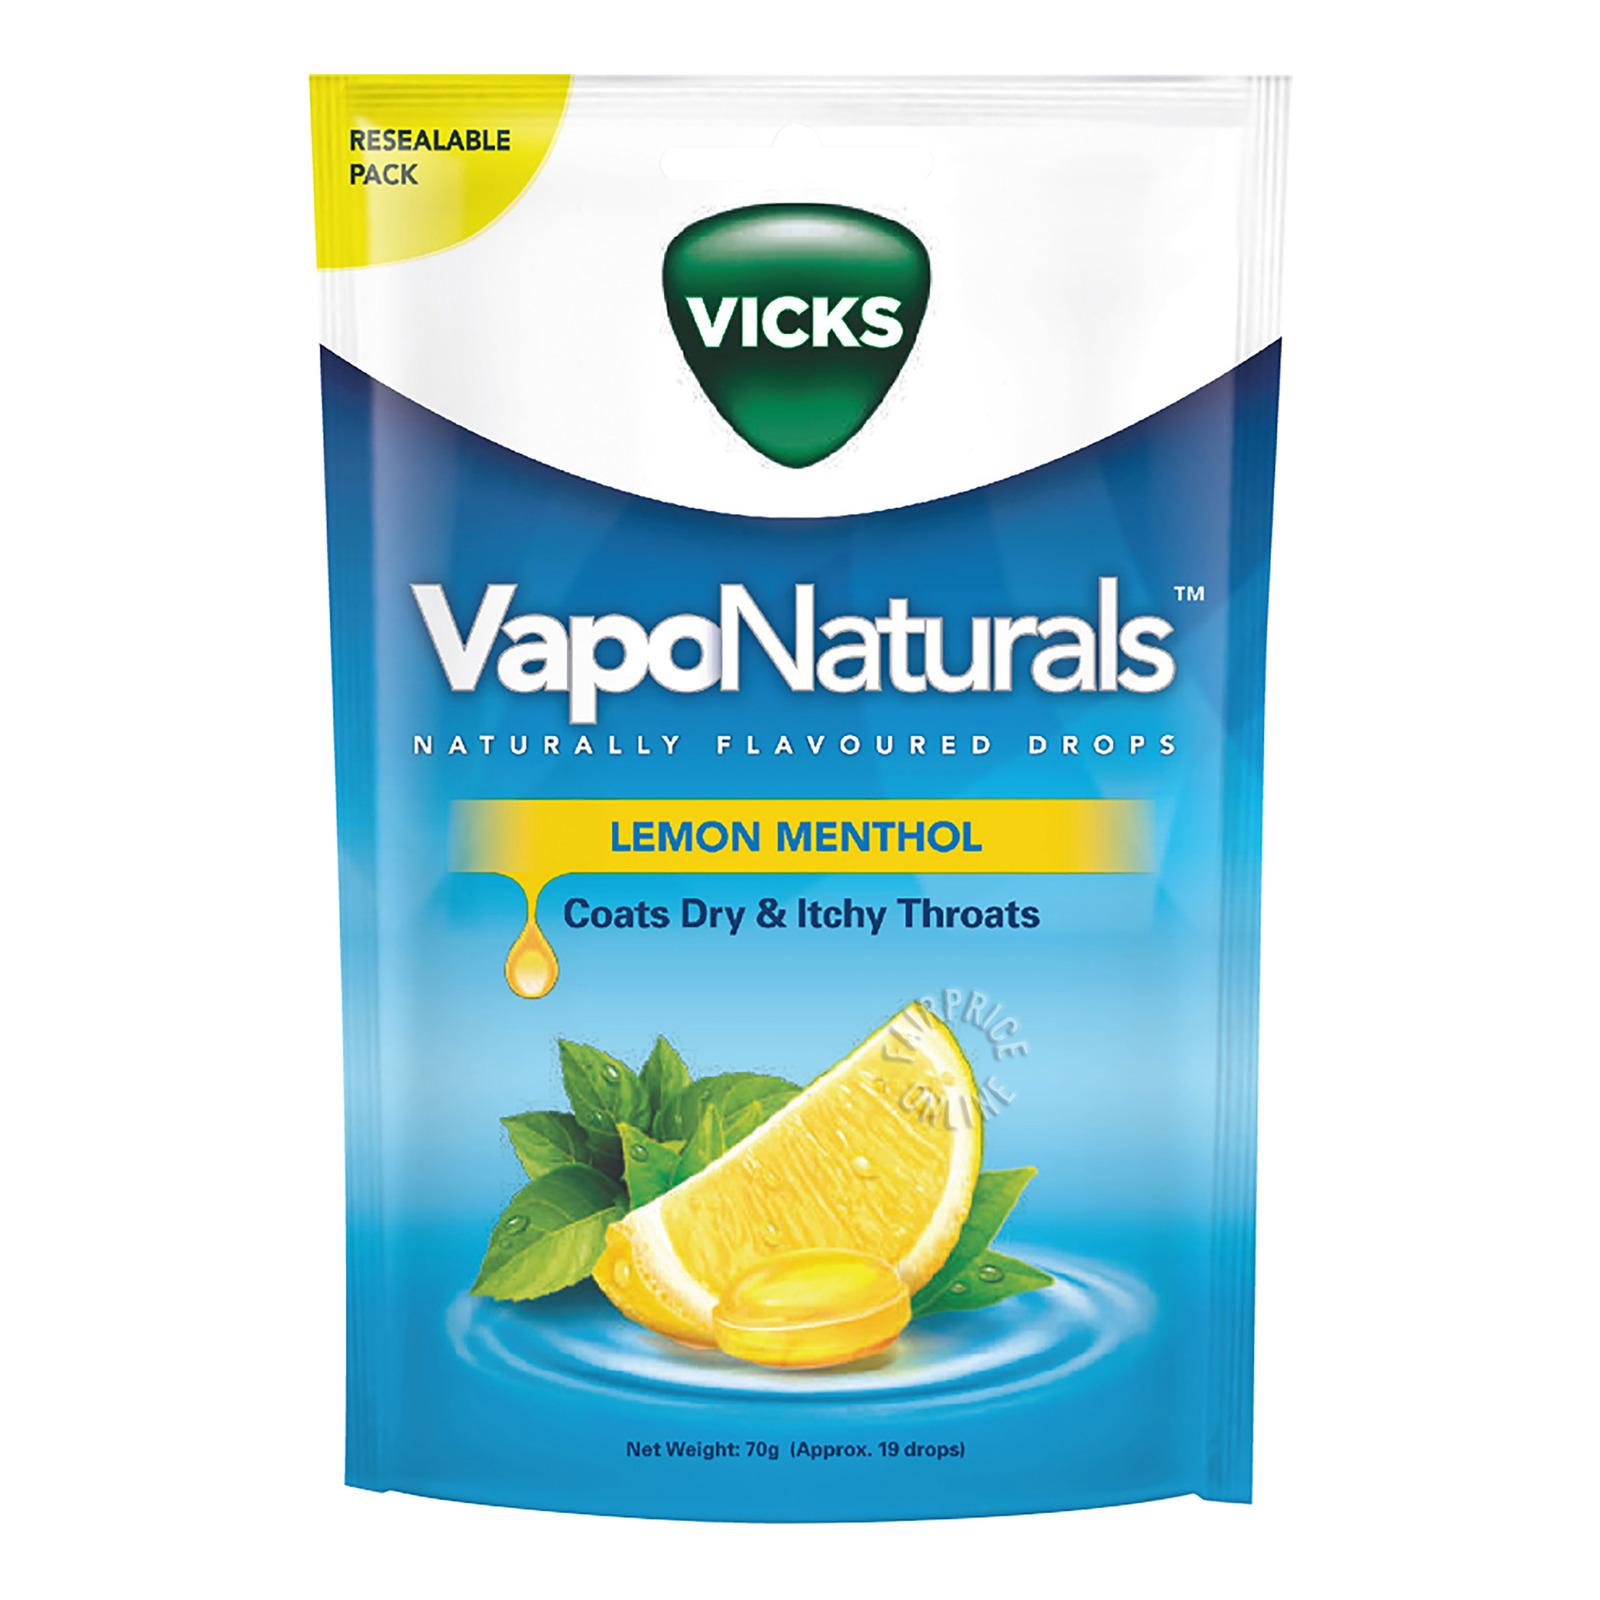 Vicks VapoNaturals Drops - Lemon Menthol